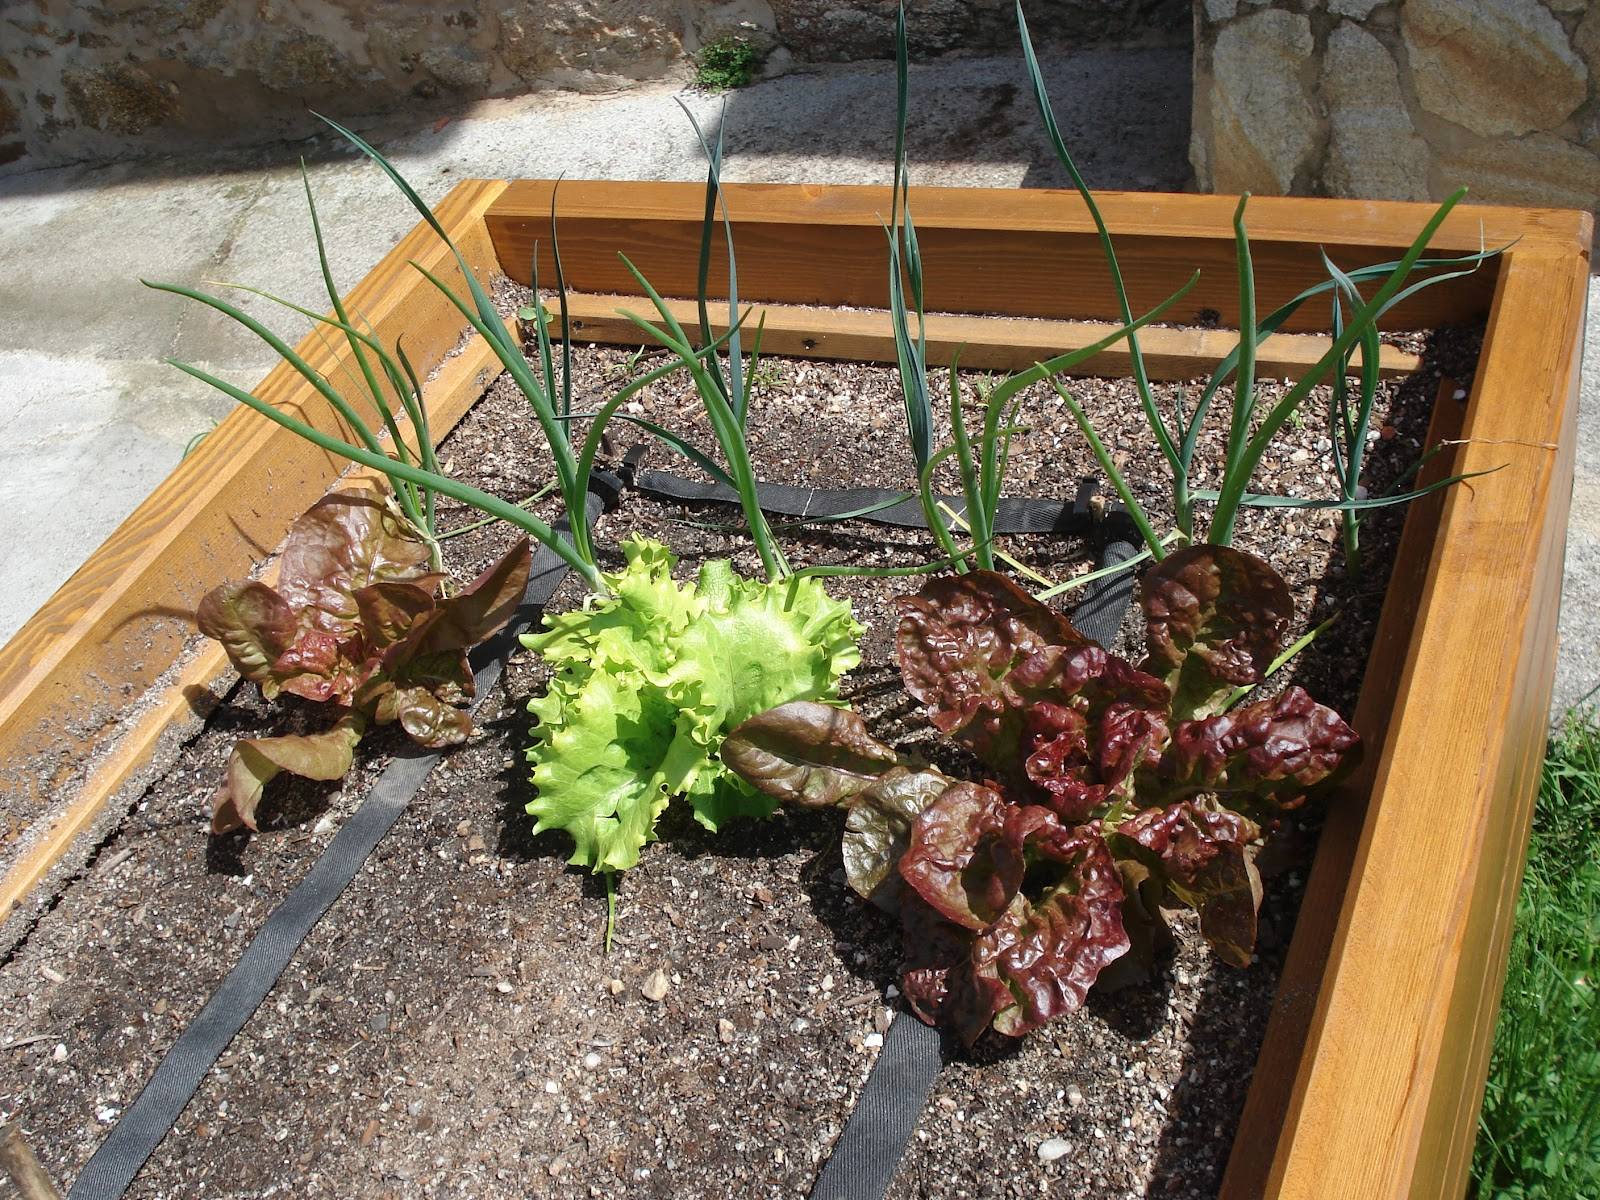 Madreselva jardiner a ecol gica madreselva xardiner a for Jardineria ecologica